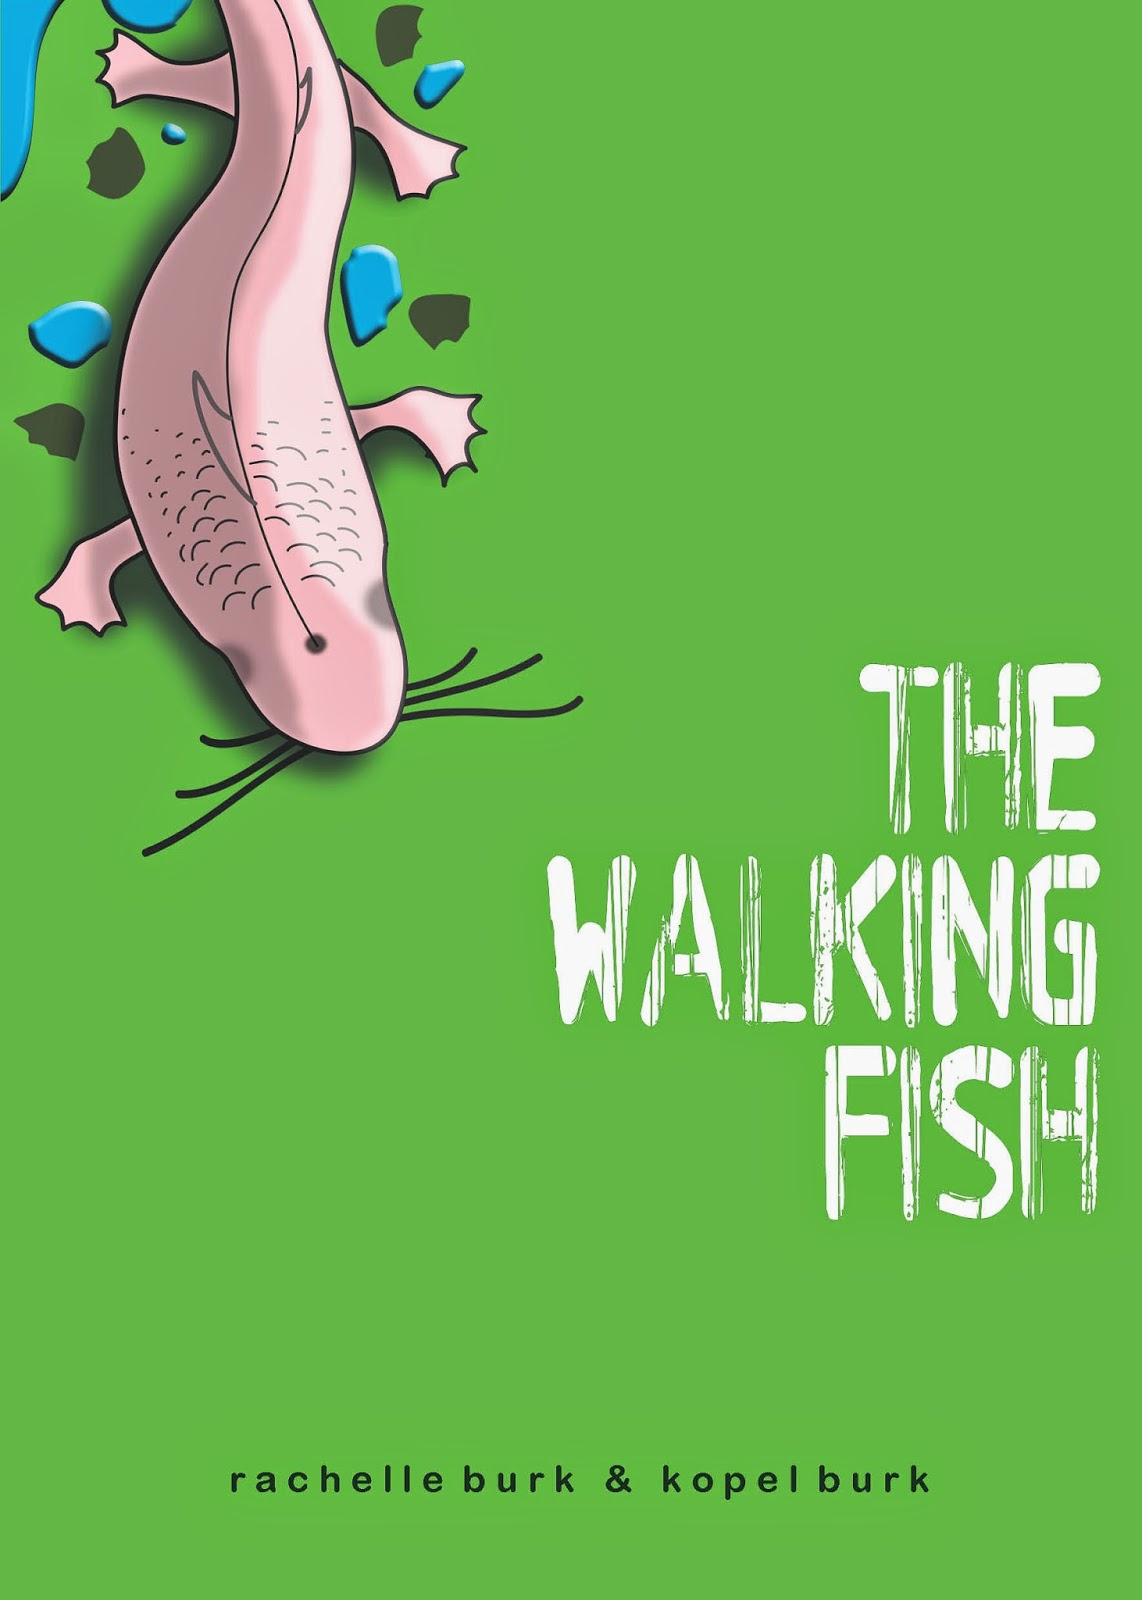 Rachelle burk children 39 s author school author visits for The walking fish